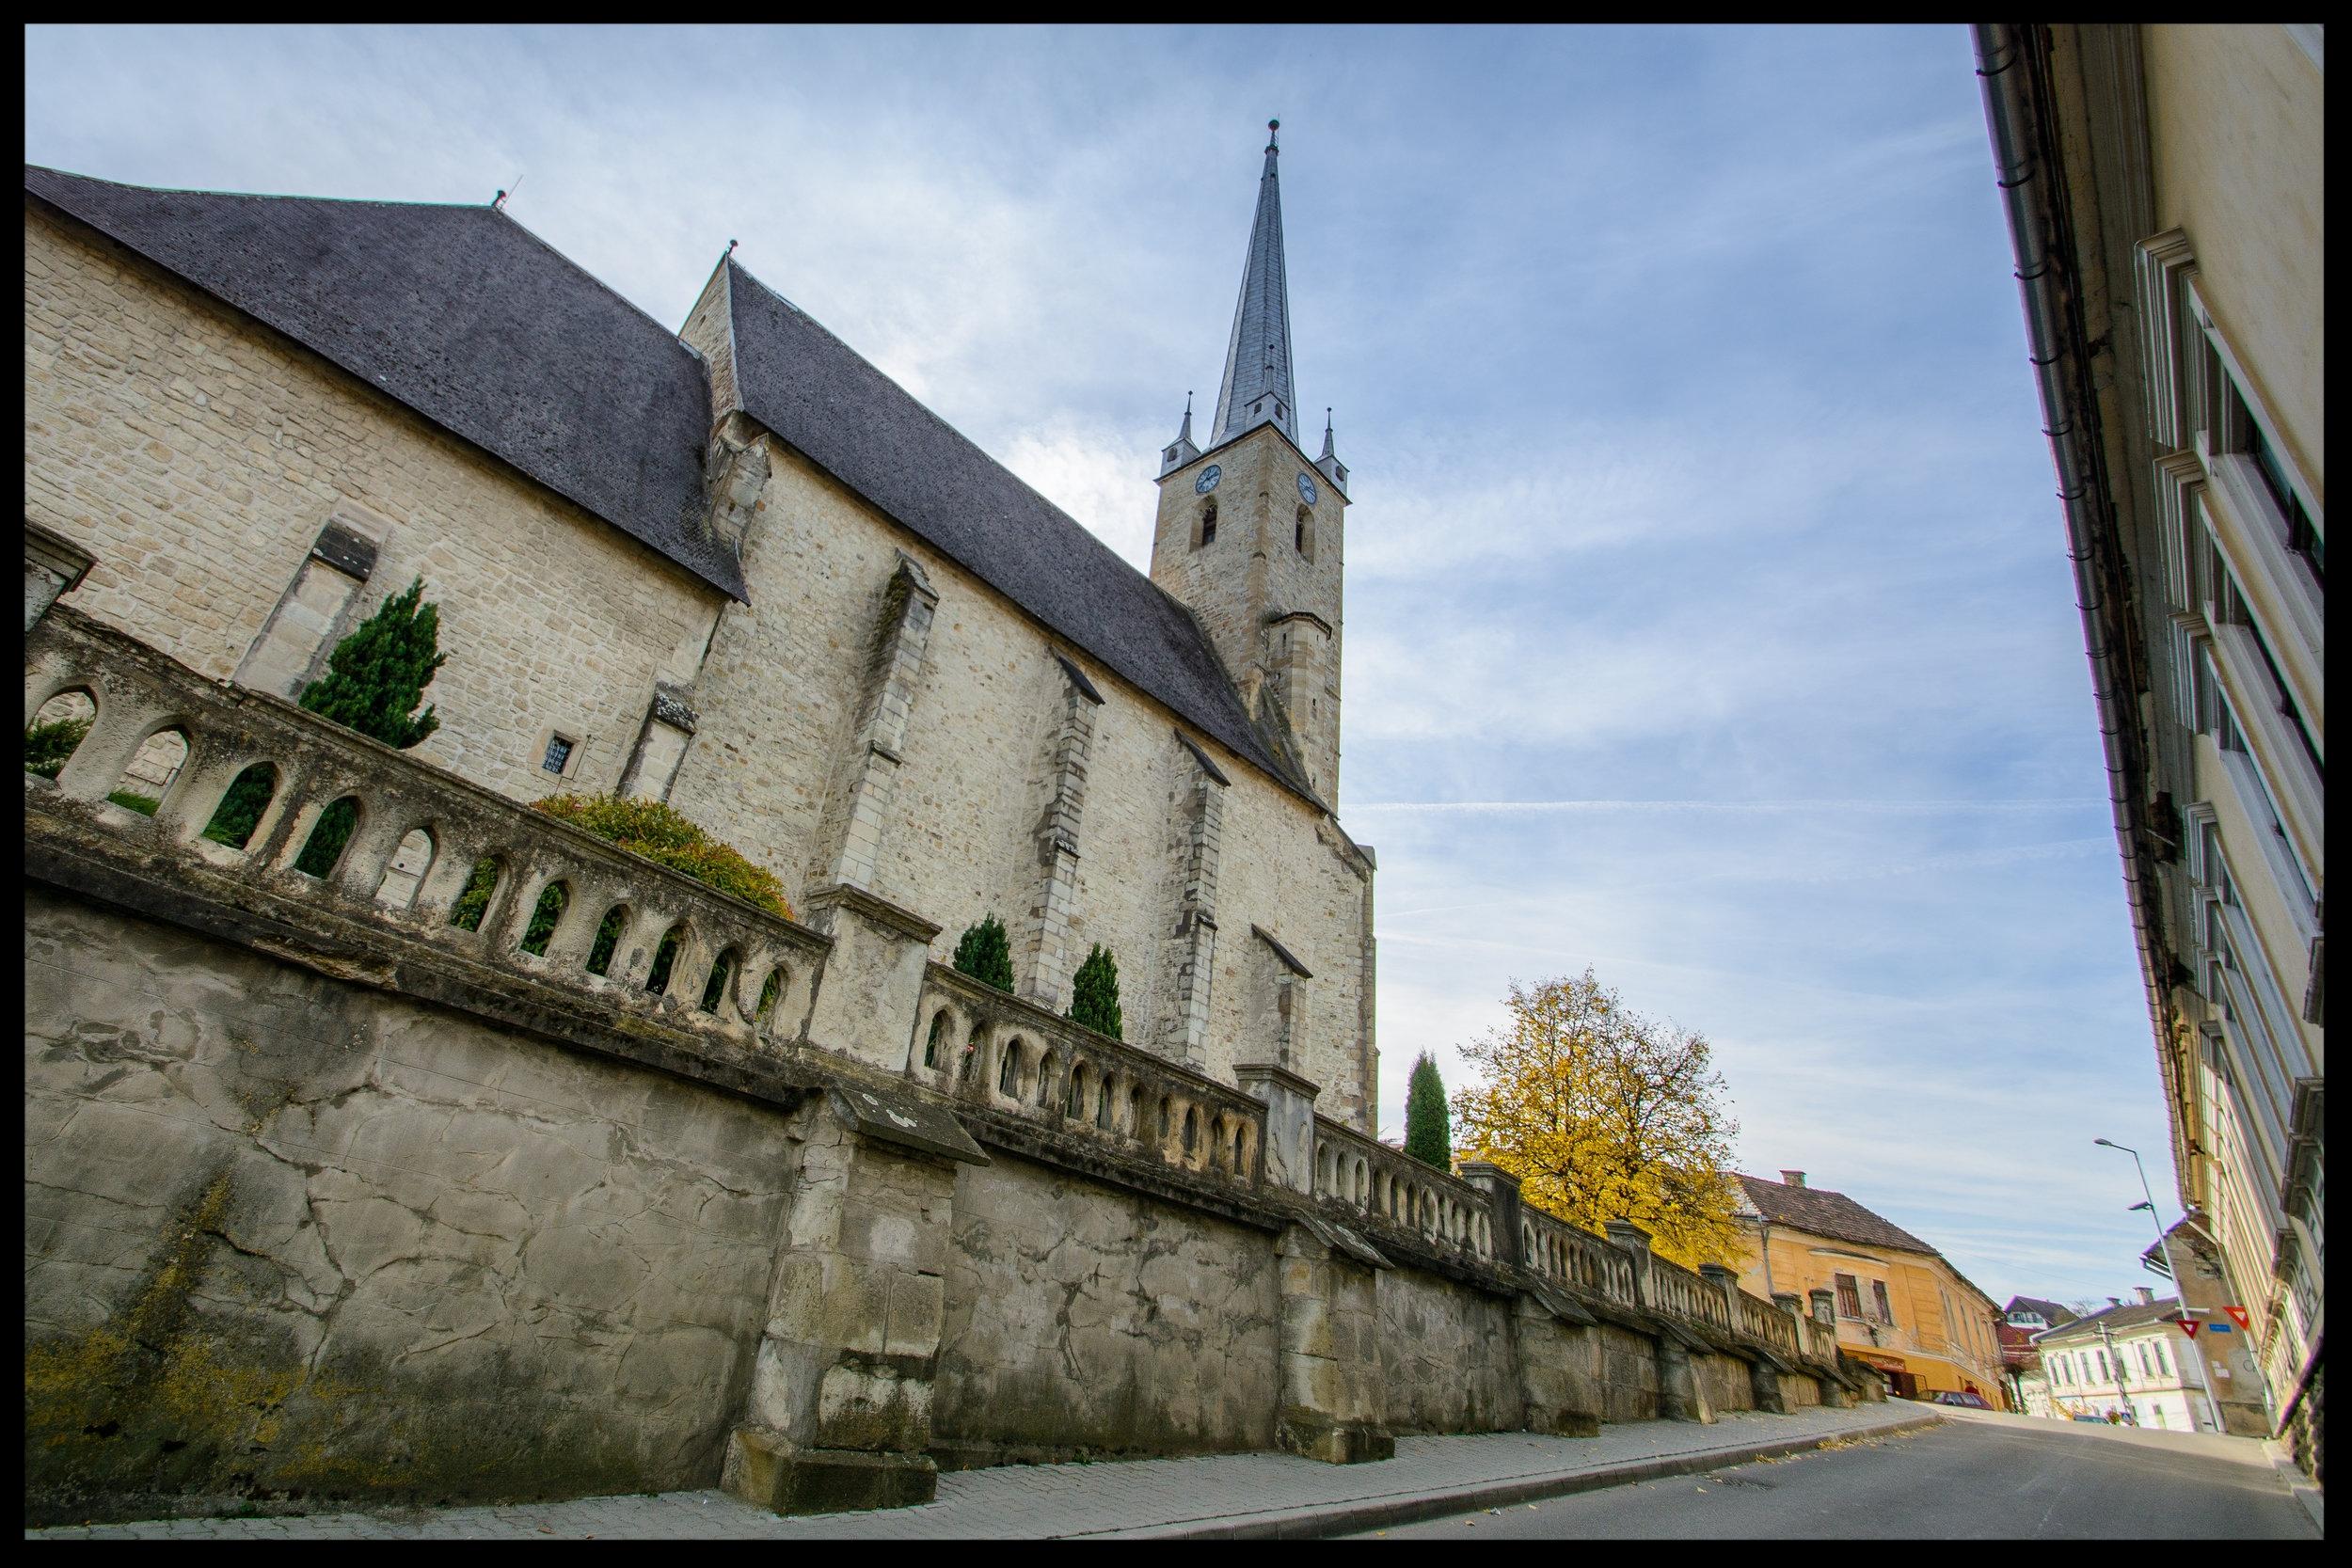 Whiteville's Sister City: Dej, Romania